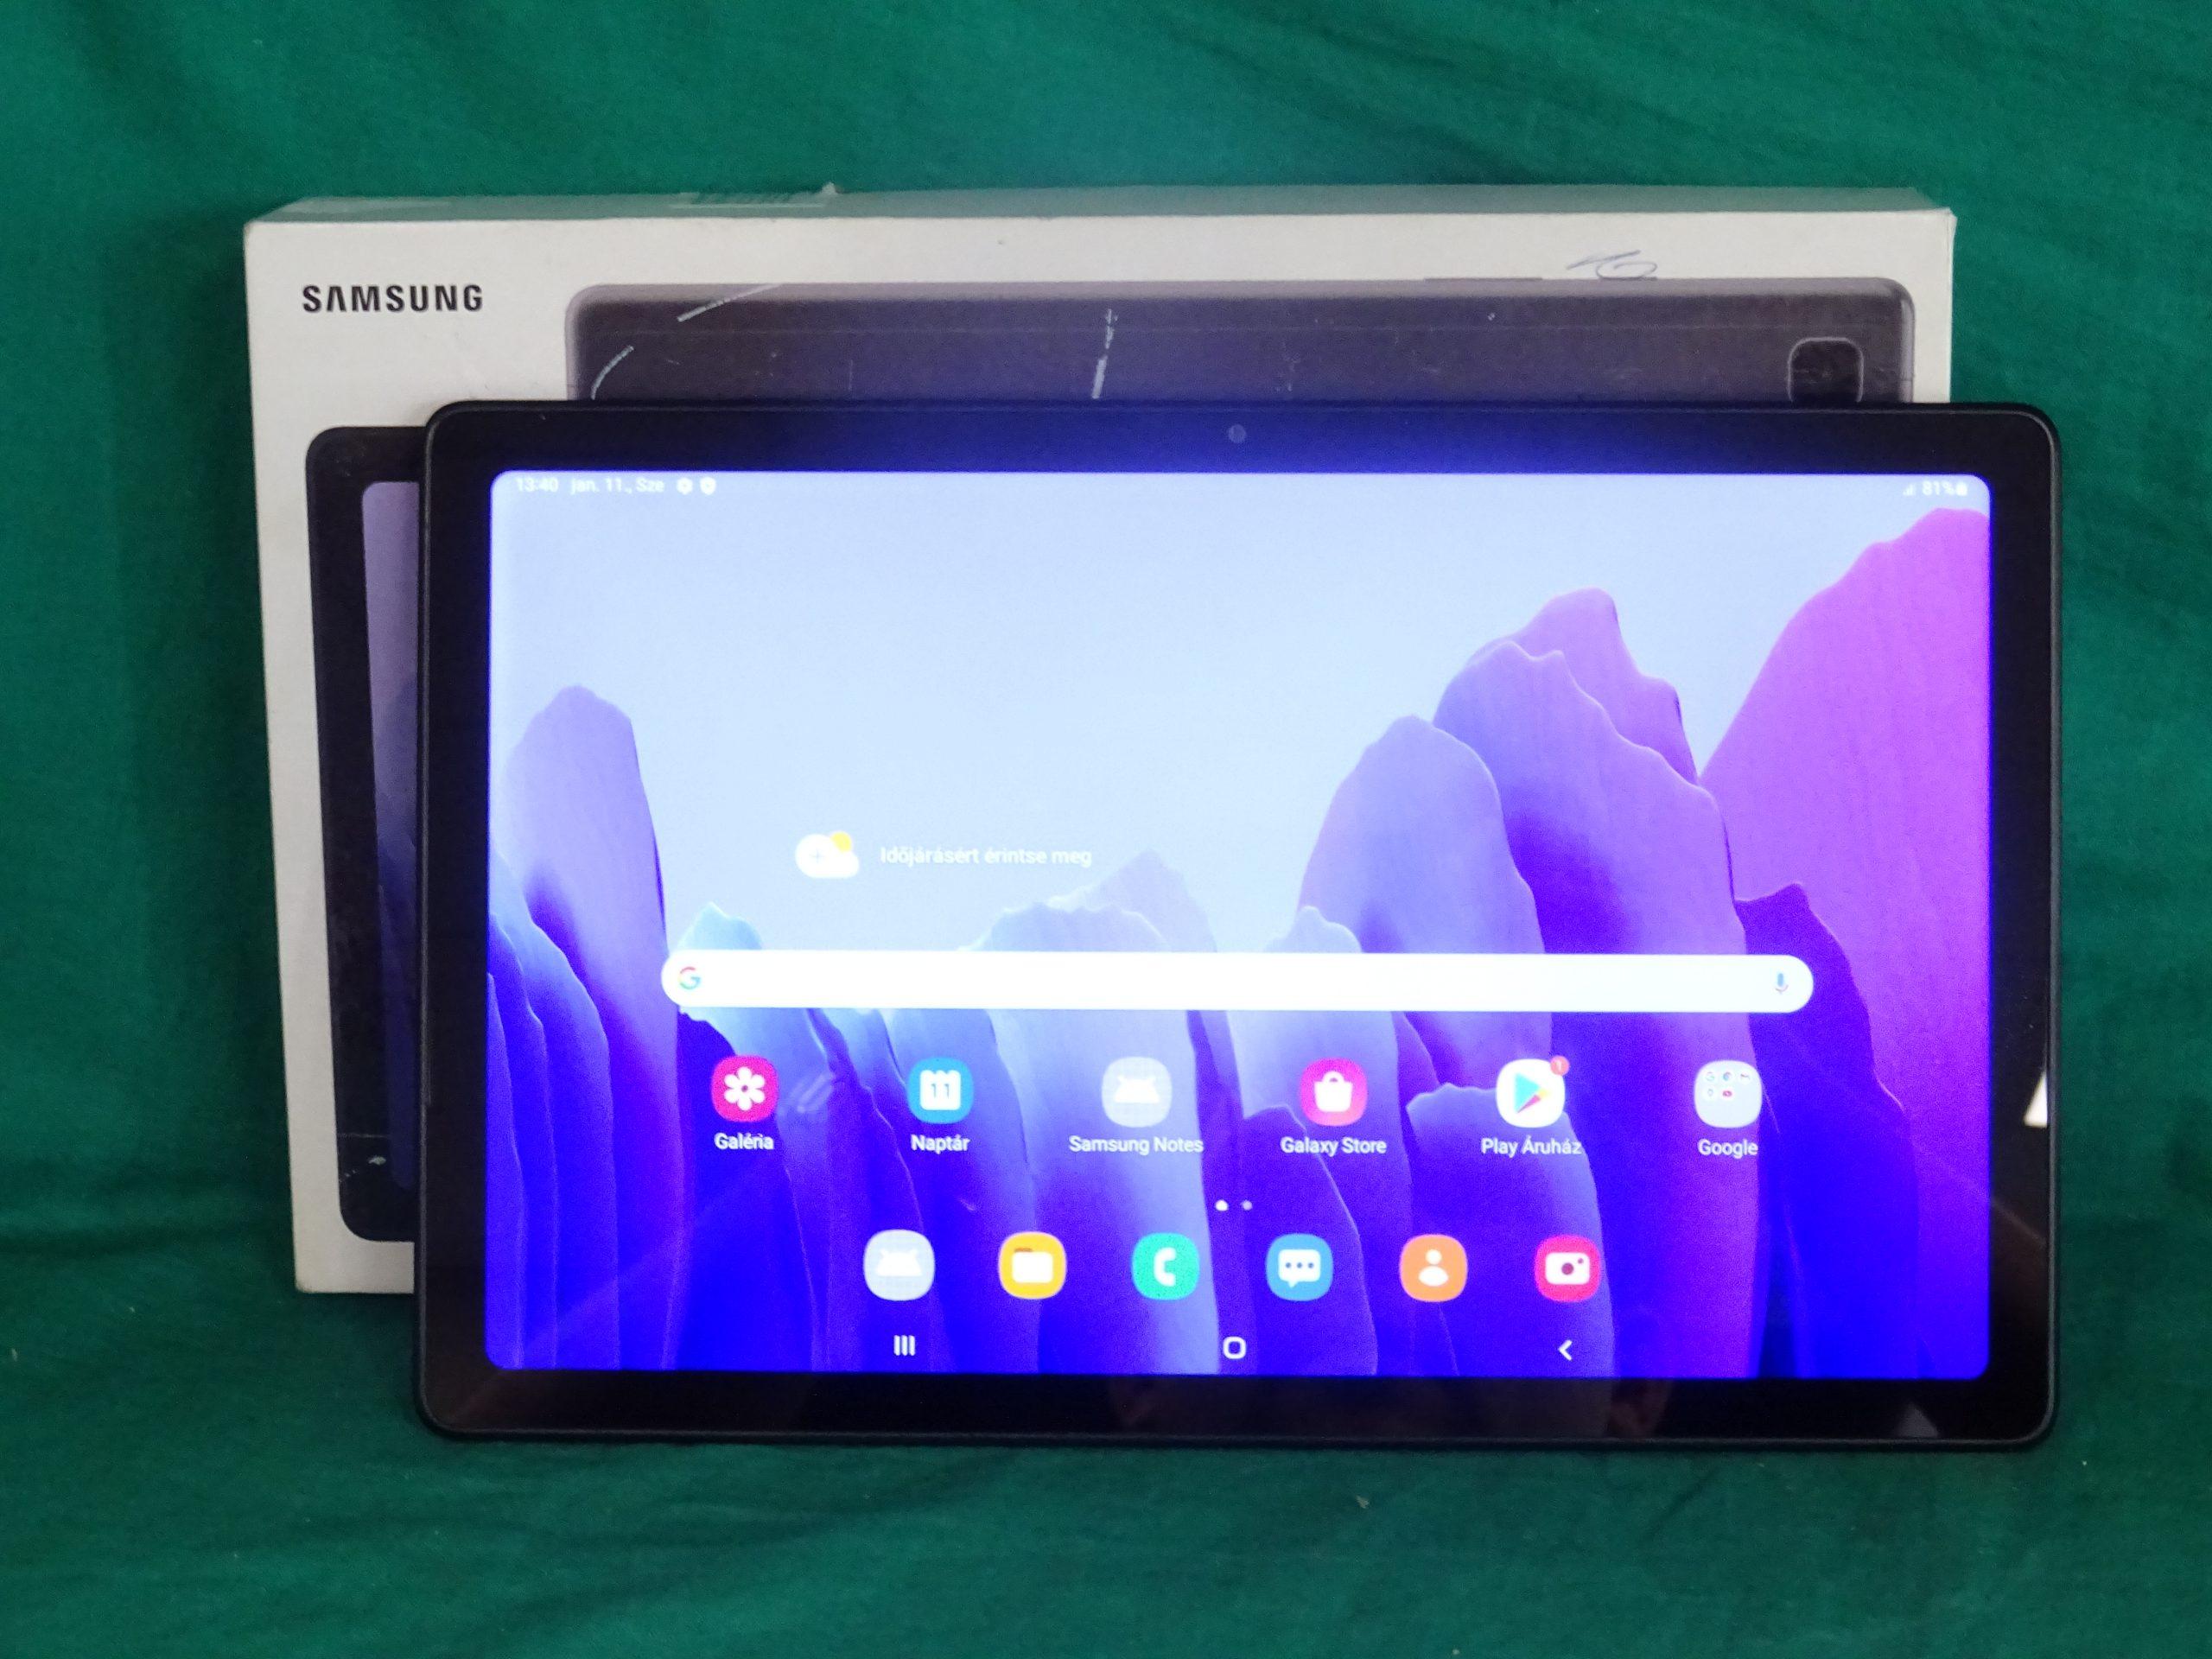 Fujitsu wireless keyboard set lx390 billentyűzet, kiemelt kép